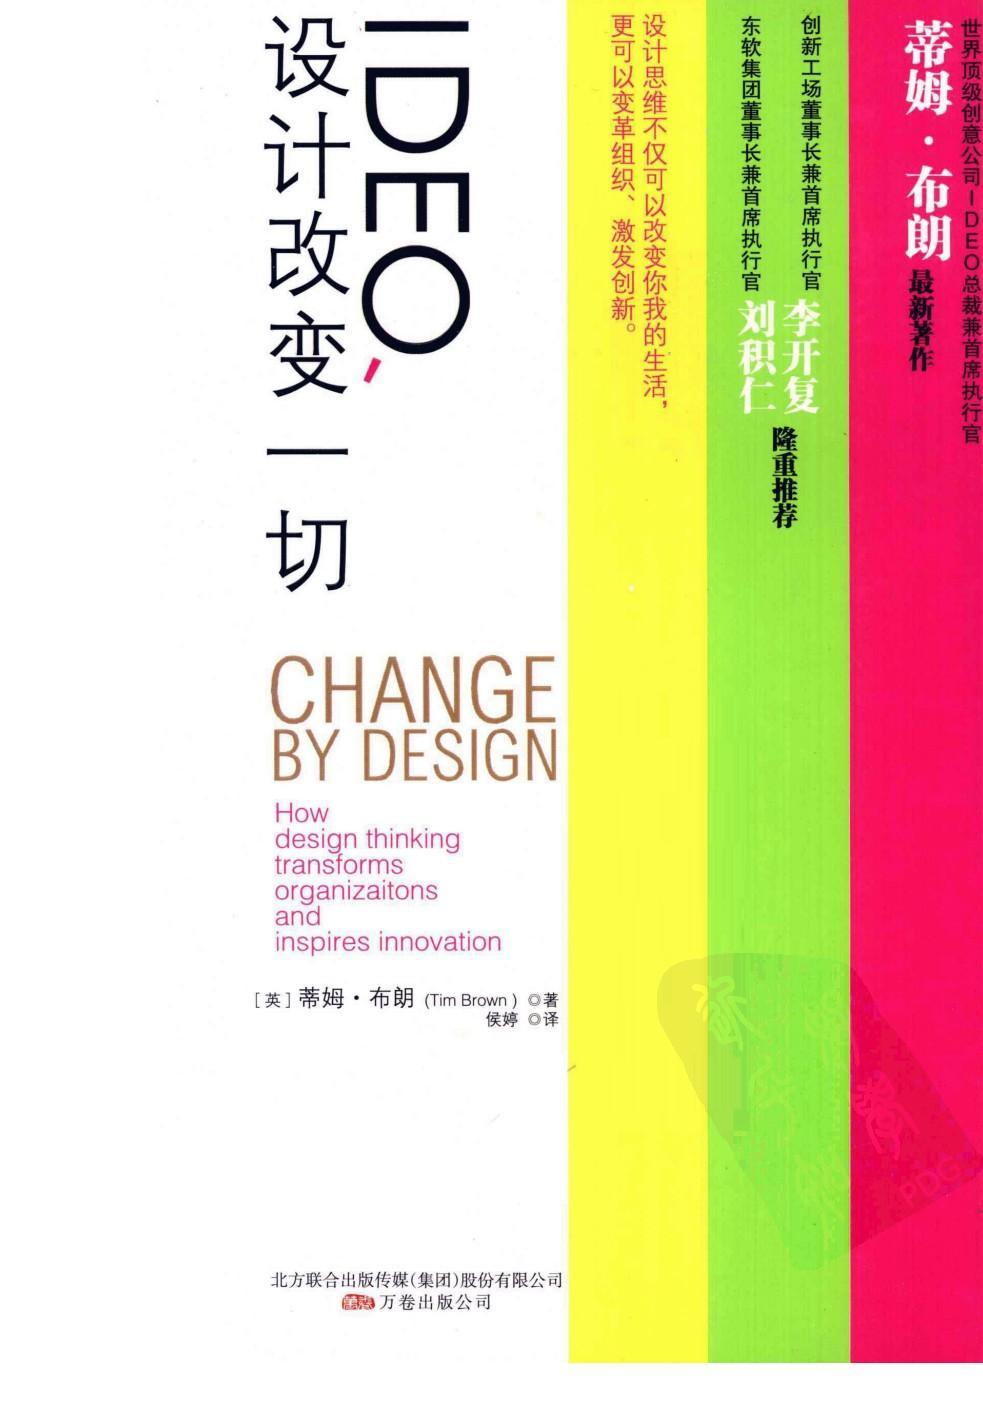 IDEO,设计改变一切-免费小说下载